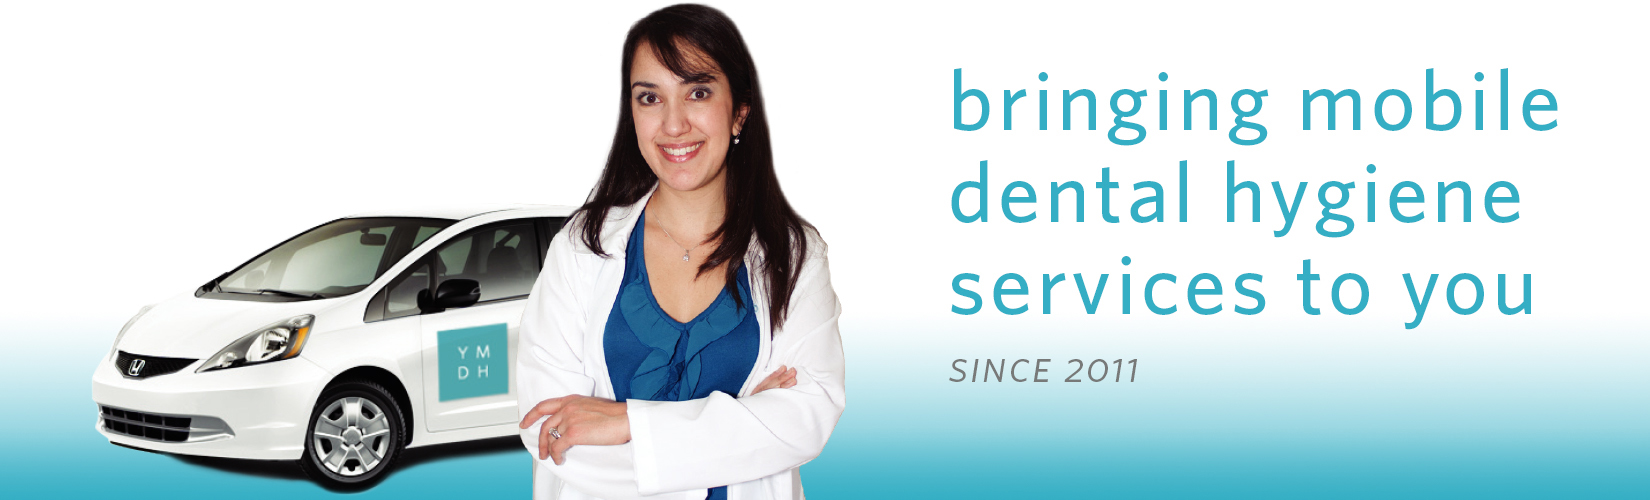 York Mobile Dental Hygiene